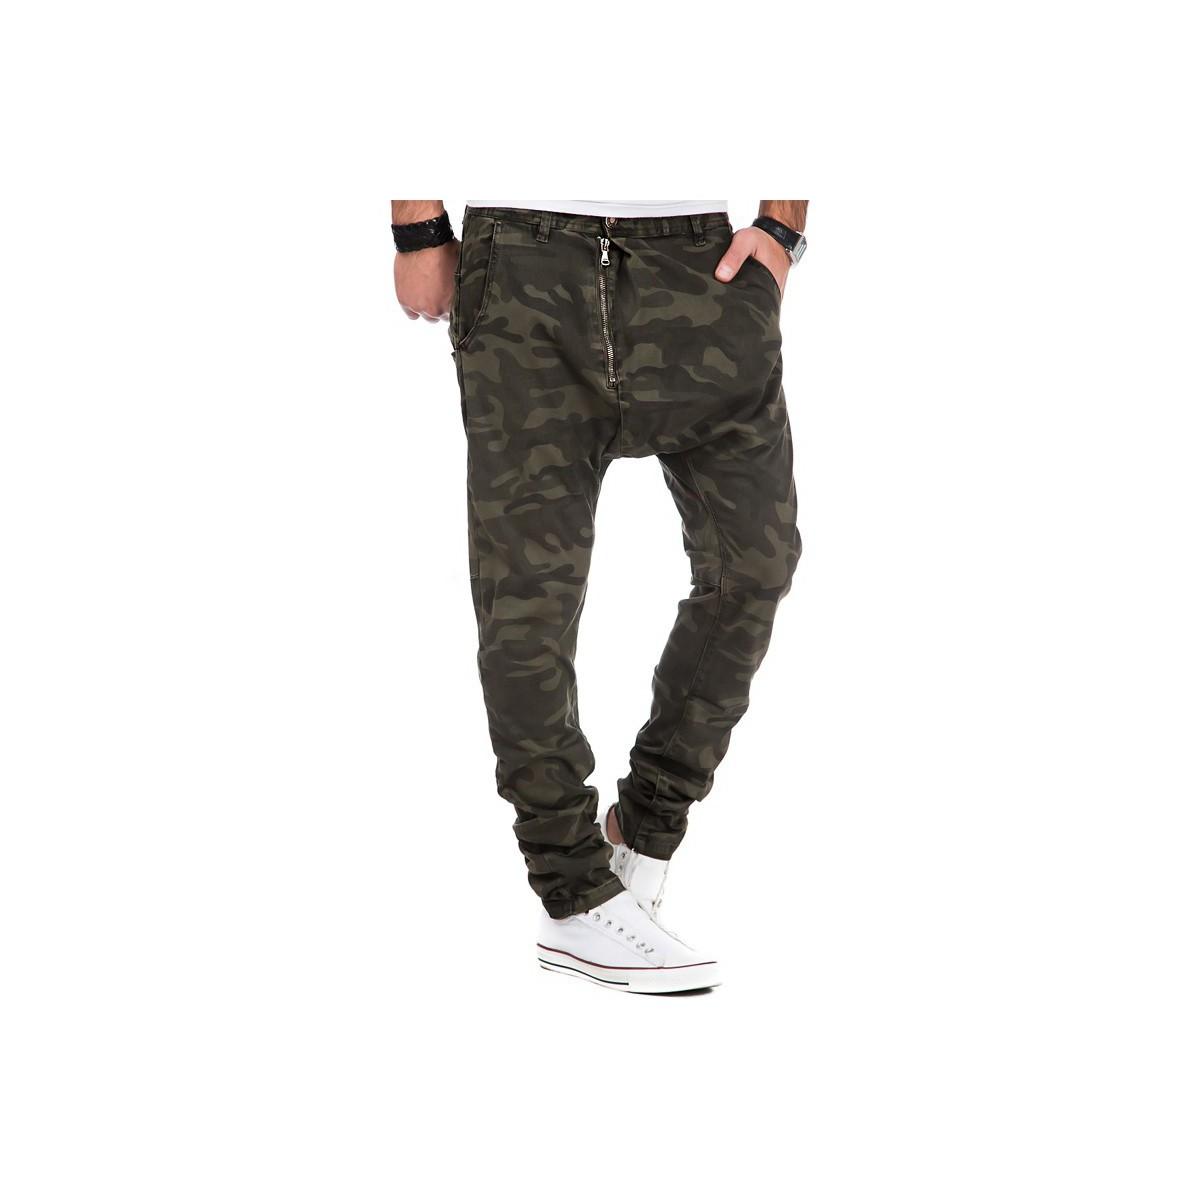 justing sarouel jean homme vert sarouel 8262 vert vert v tements jeans homme 37 32. Black Bedroom Furniture Sets. Home Design Ideas